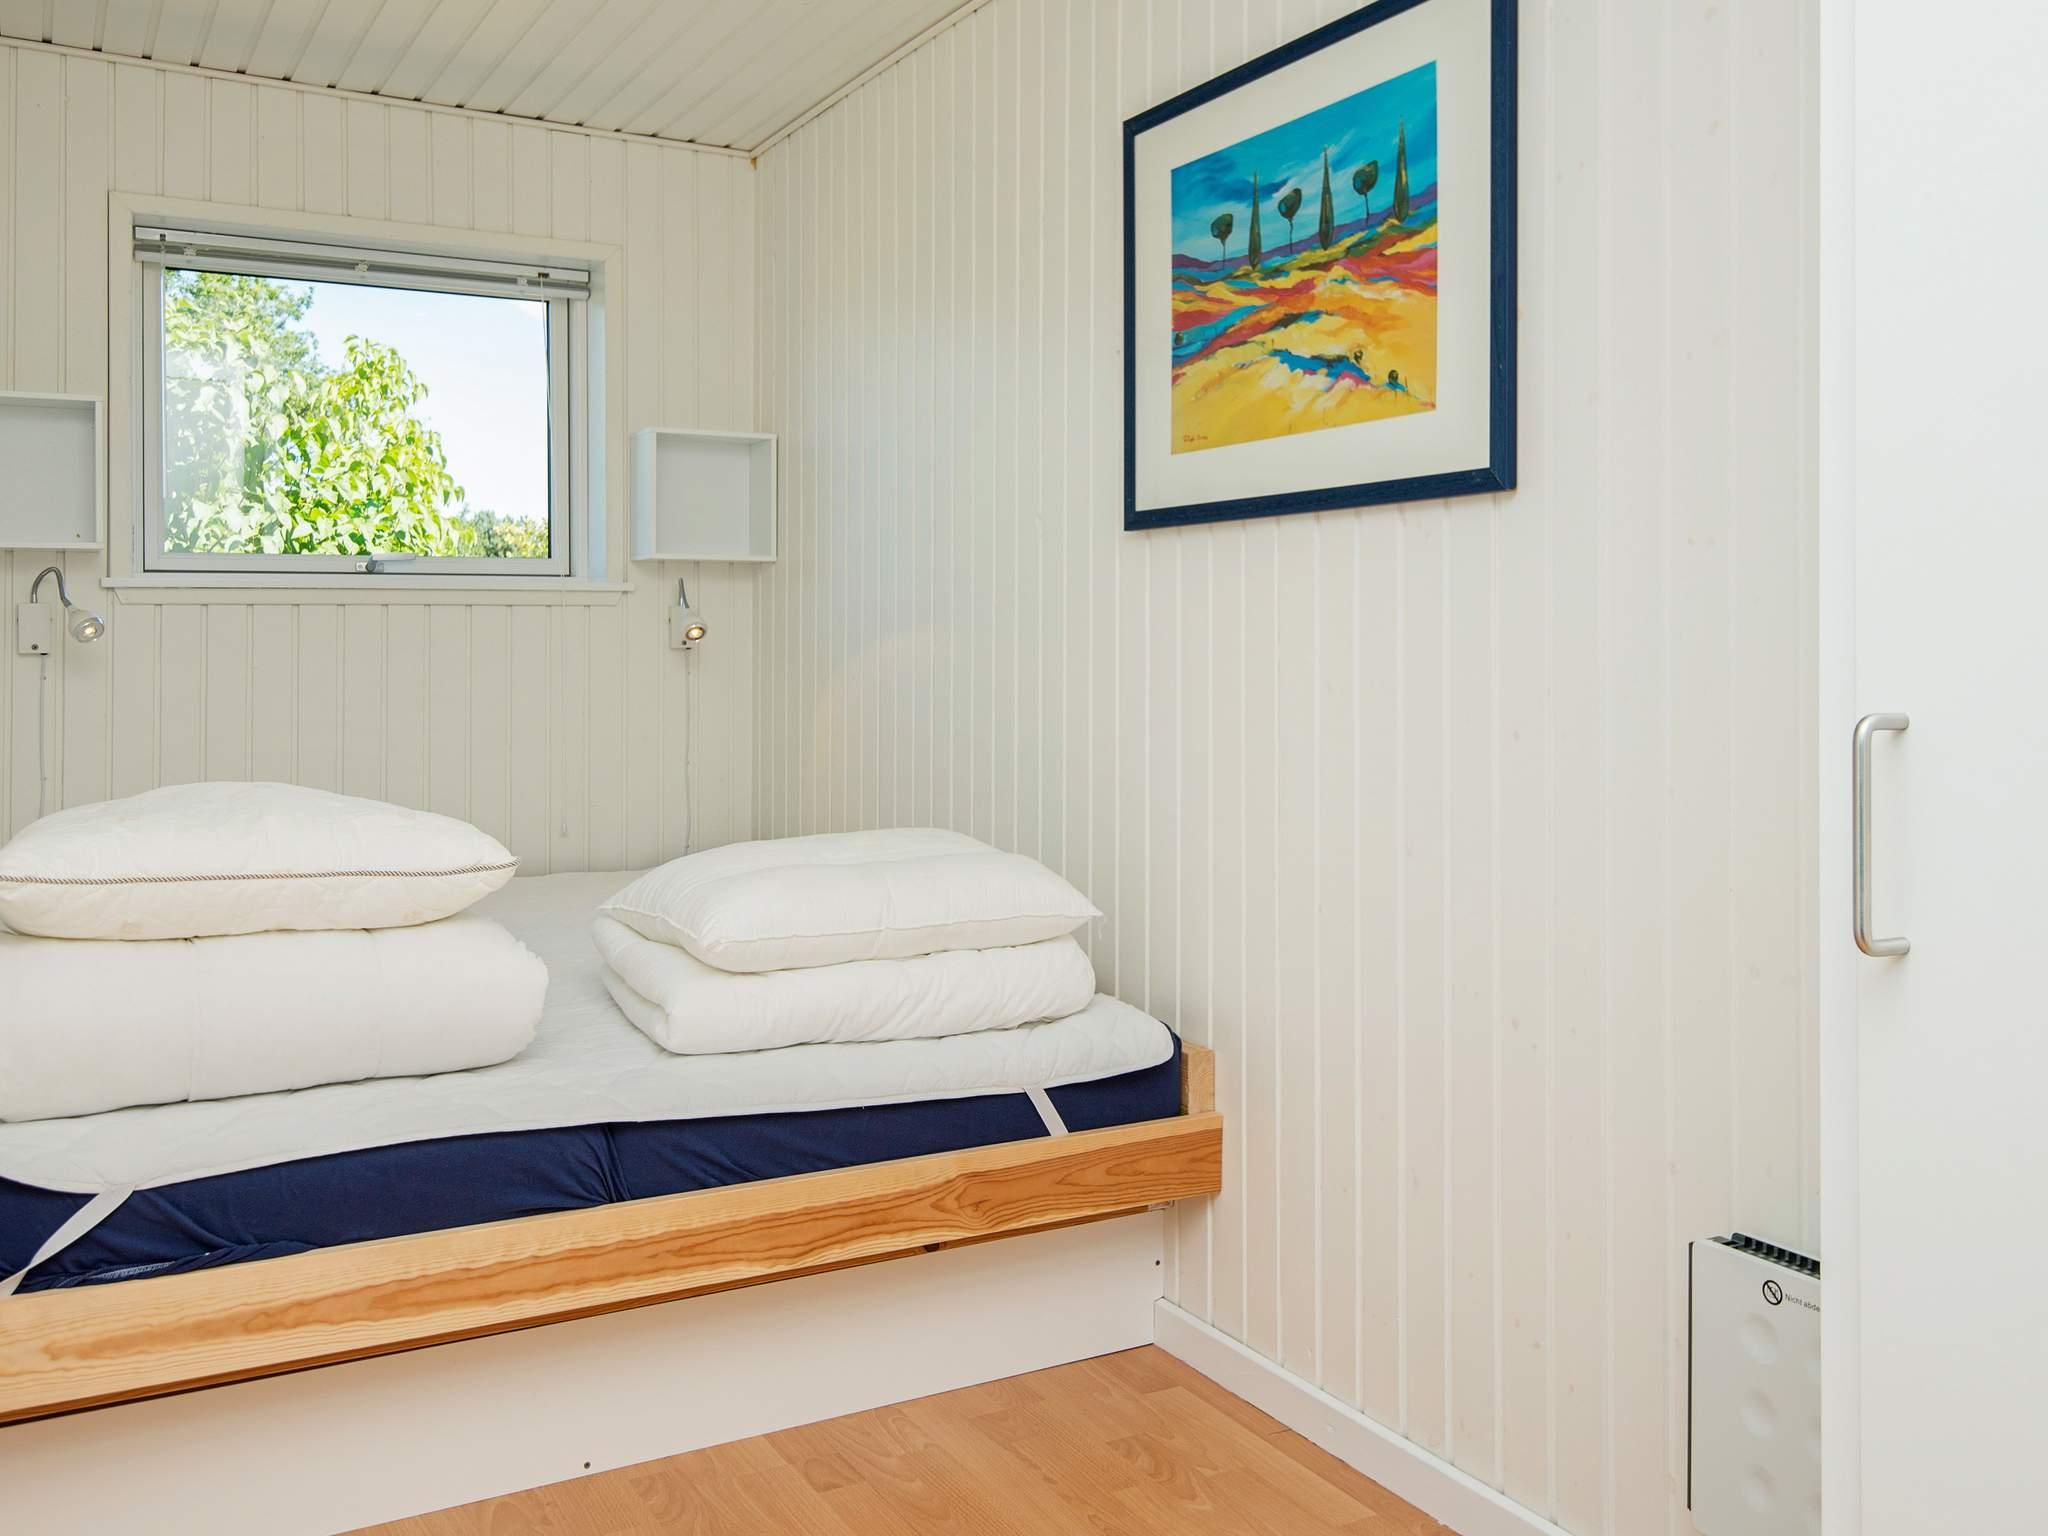 Maison de vacances Helgenæs (978615), Knebel, , Mer Baltique danoise, Danemark, image 8